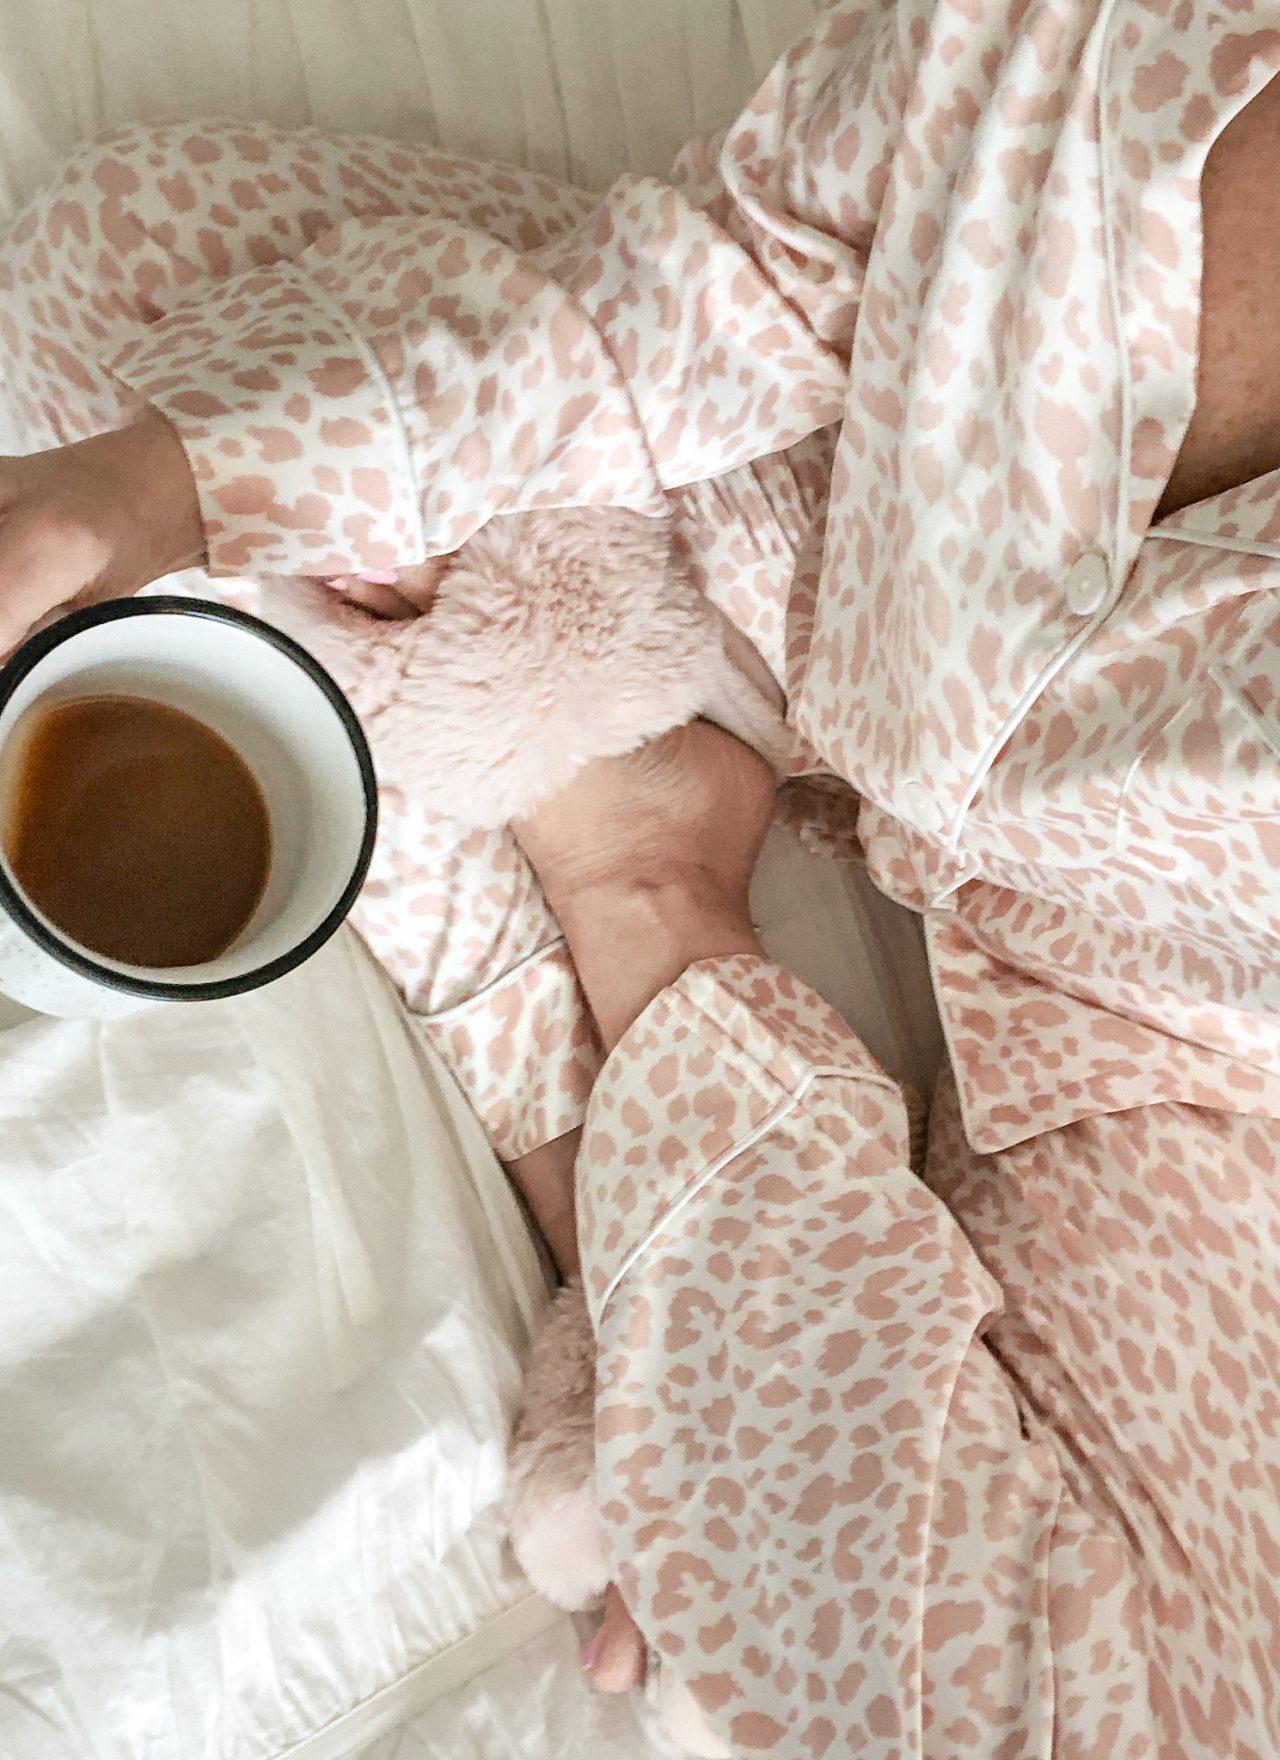 Satin long sleeve pajama set for women from Amazon